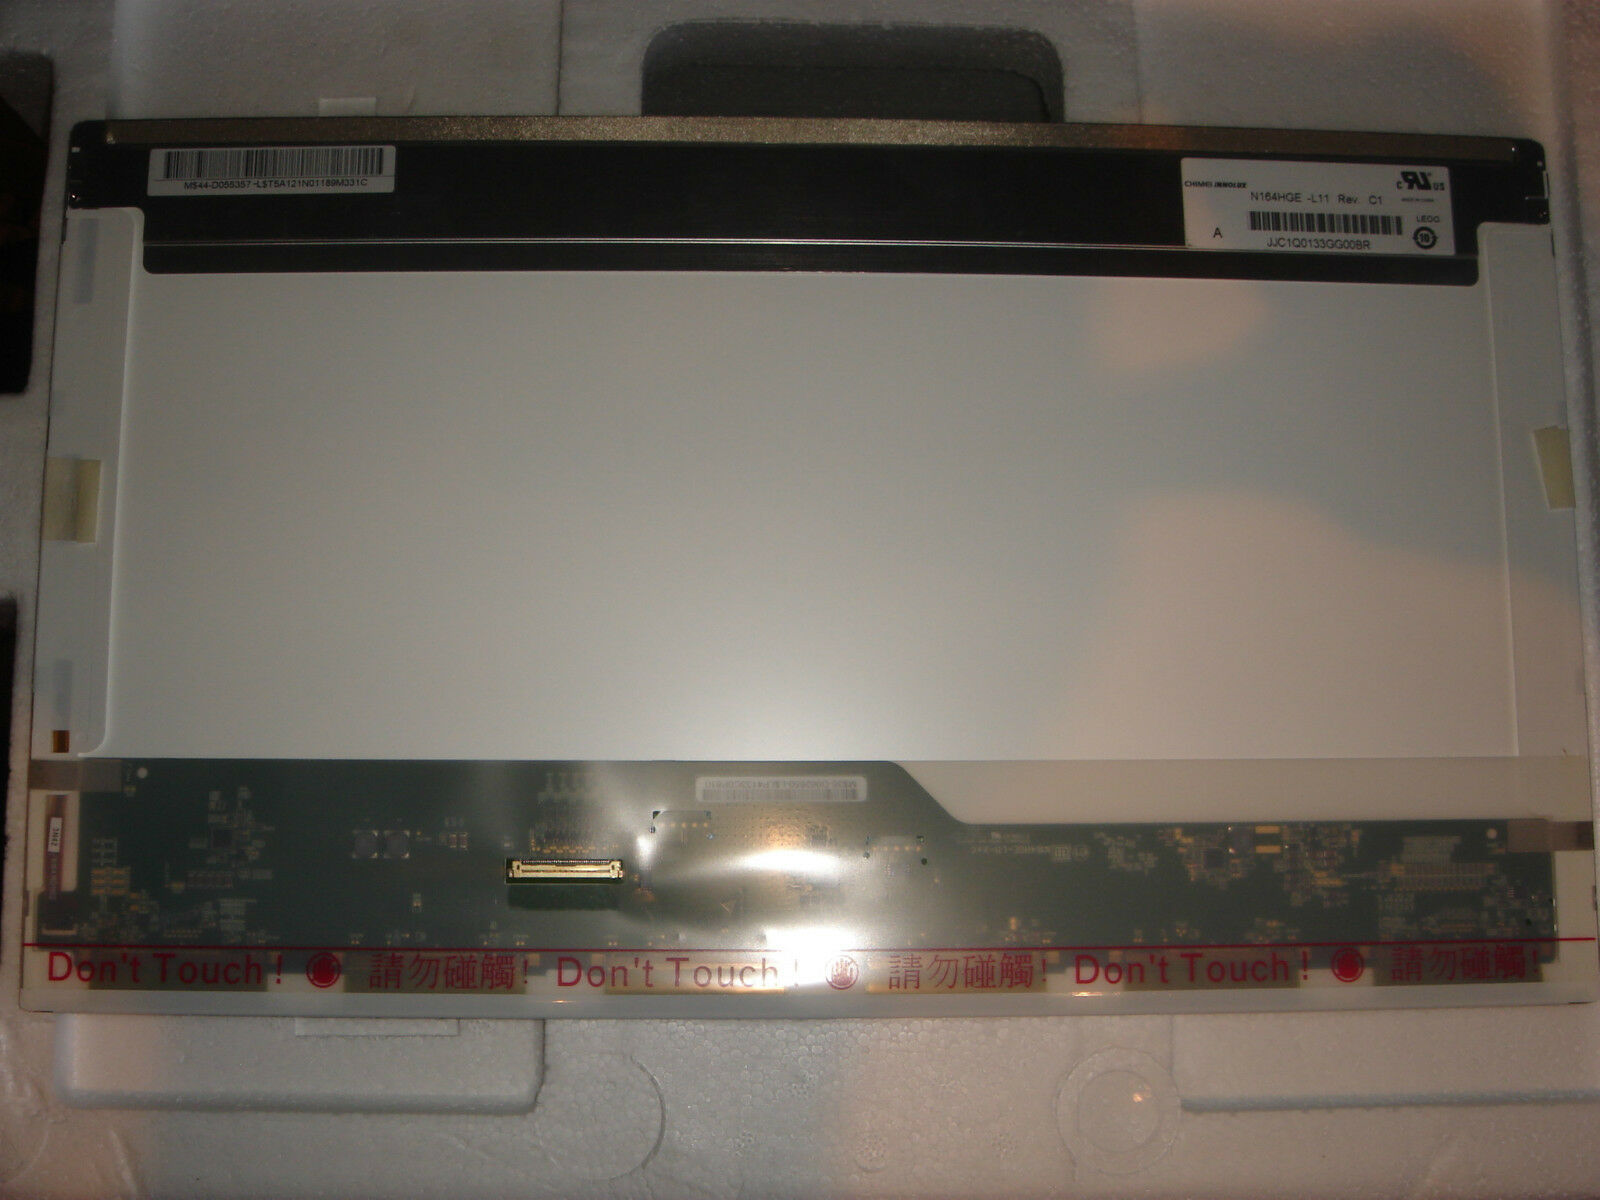 Dalle led 16.4 led screen sony vaio vpcf 2290s vpcf 22c5e vpcf 22j1e vpcf 22l1e